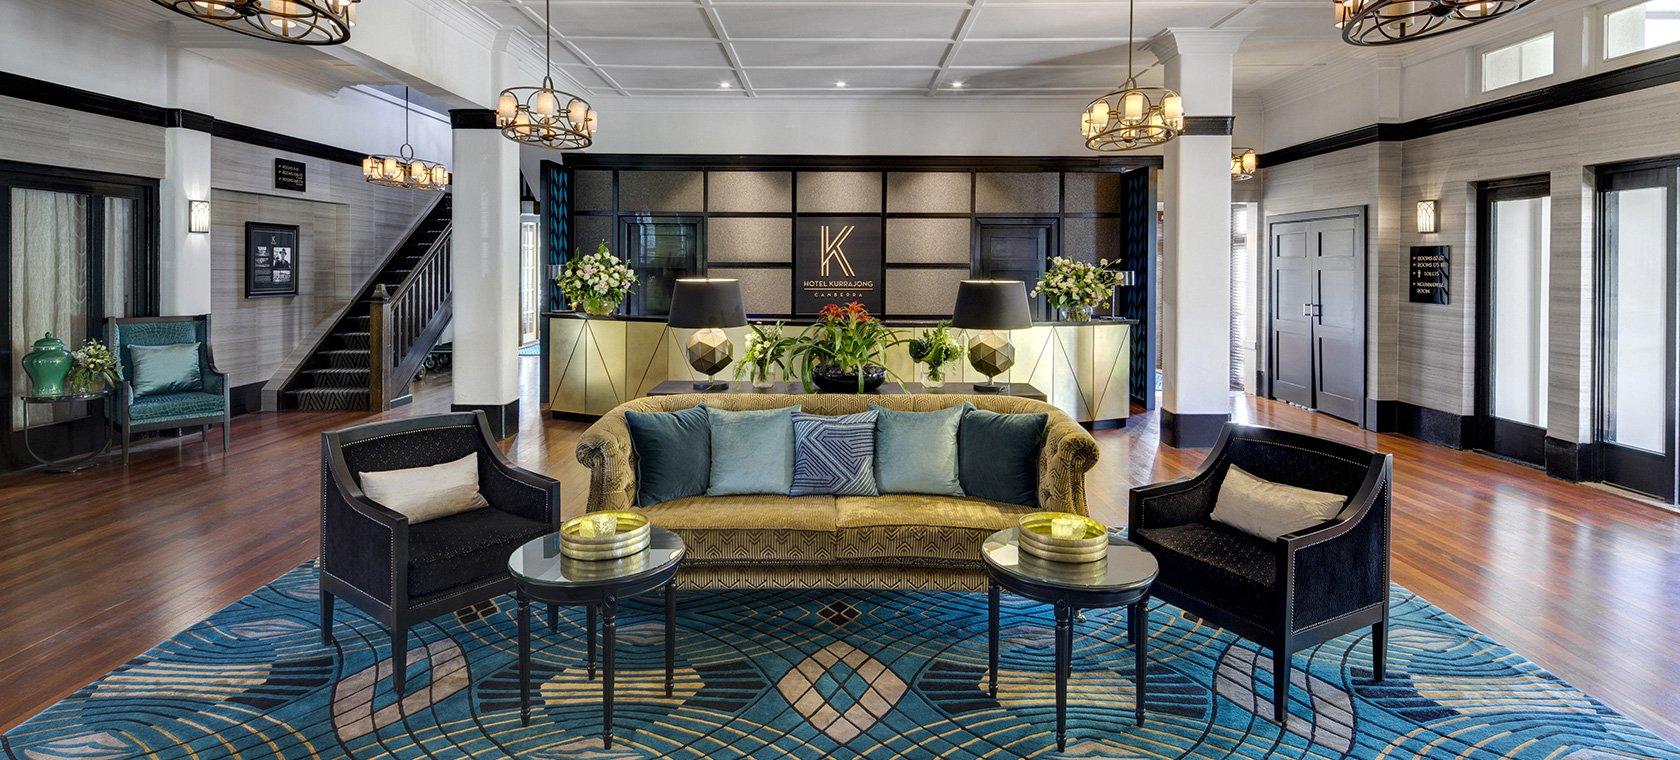 hotel-kurrajong-canberra-lobby-01-2016.66-1.jpg